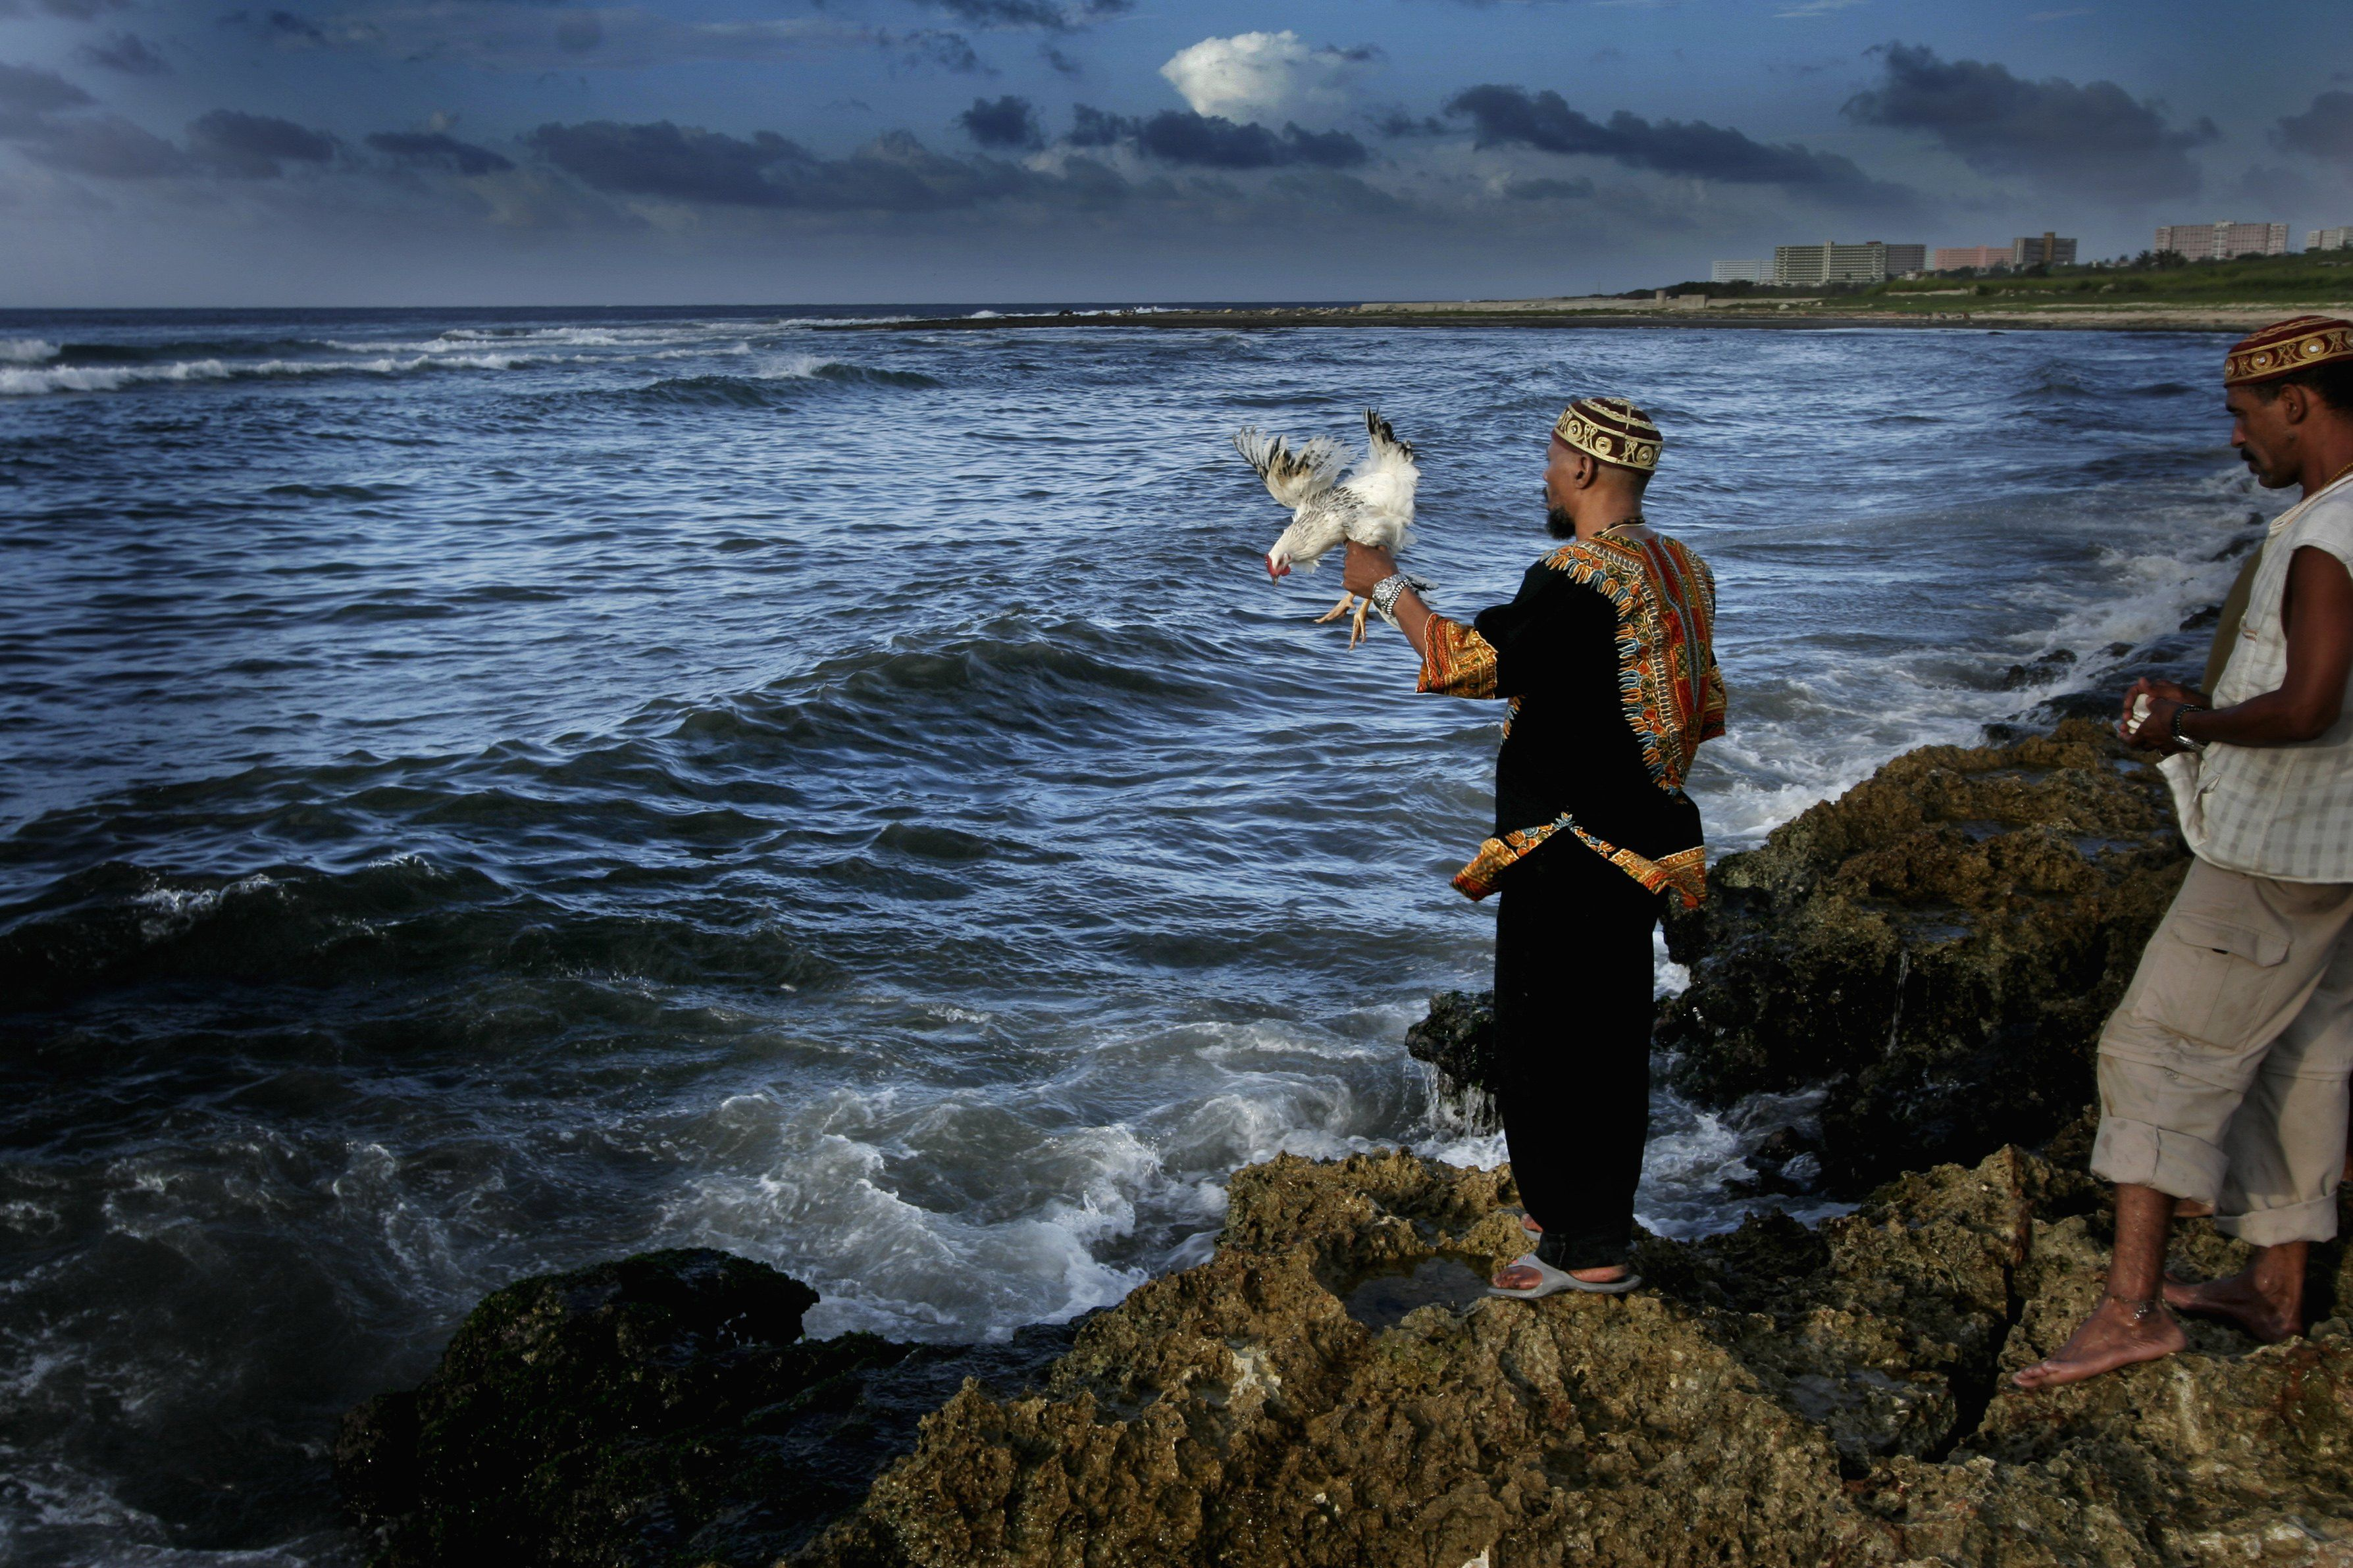 Santeria - Religion Thrives In Cuba